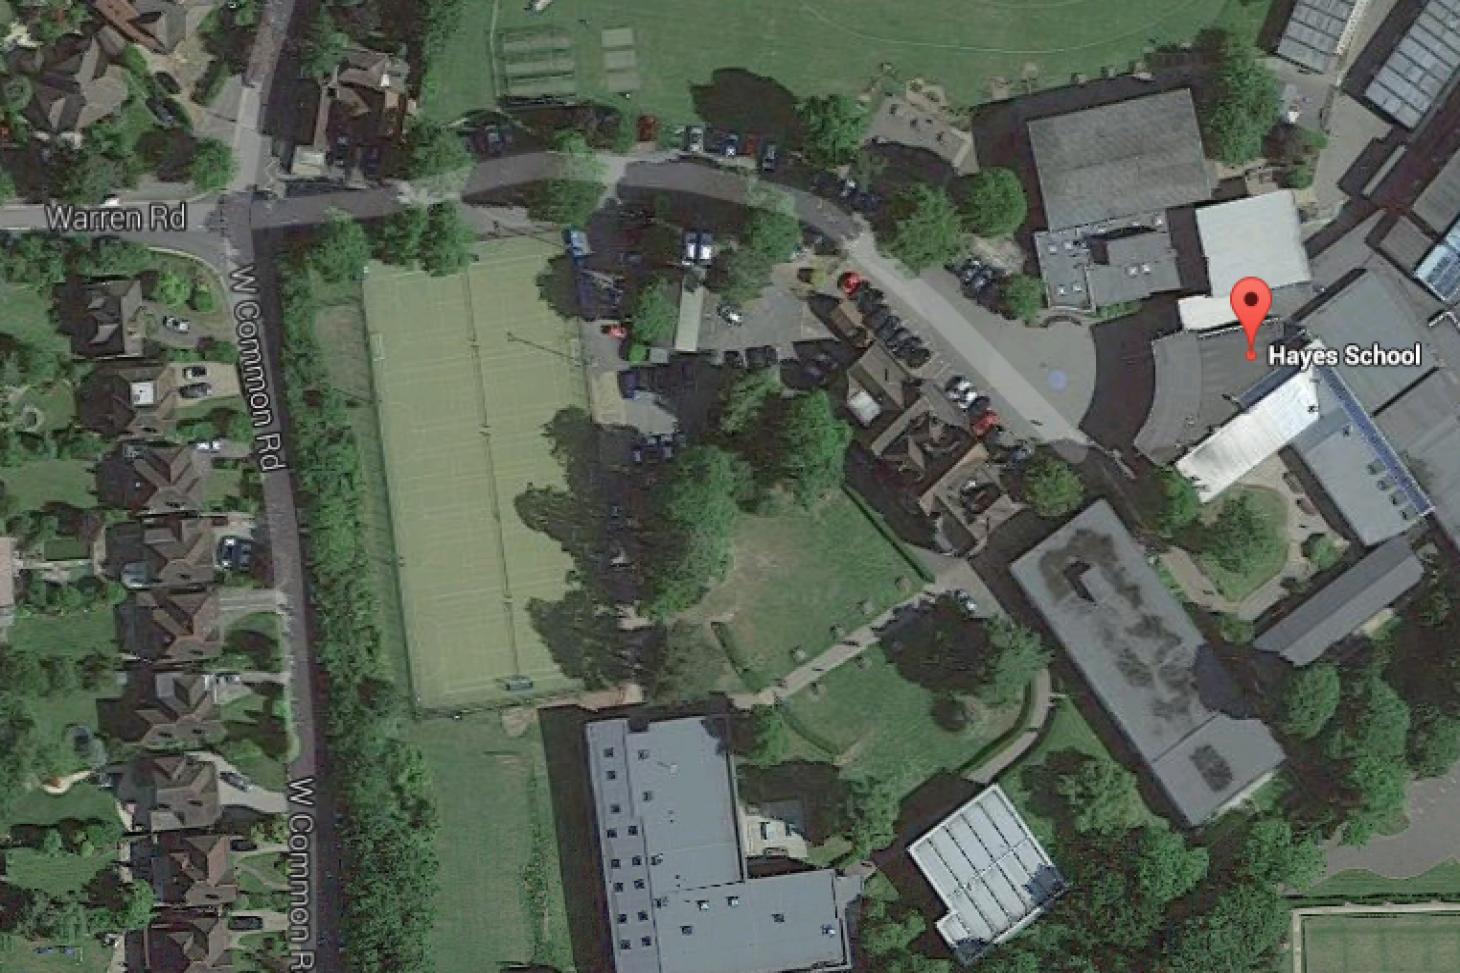 Hayes School Full size | Grass cricket facilities